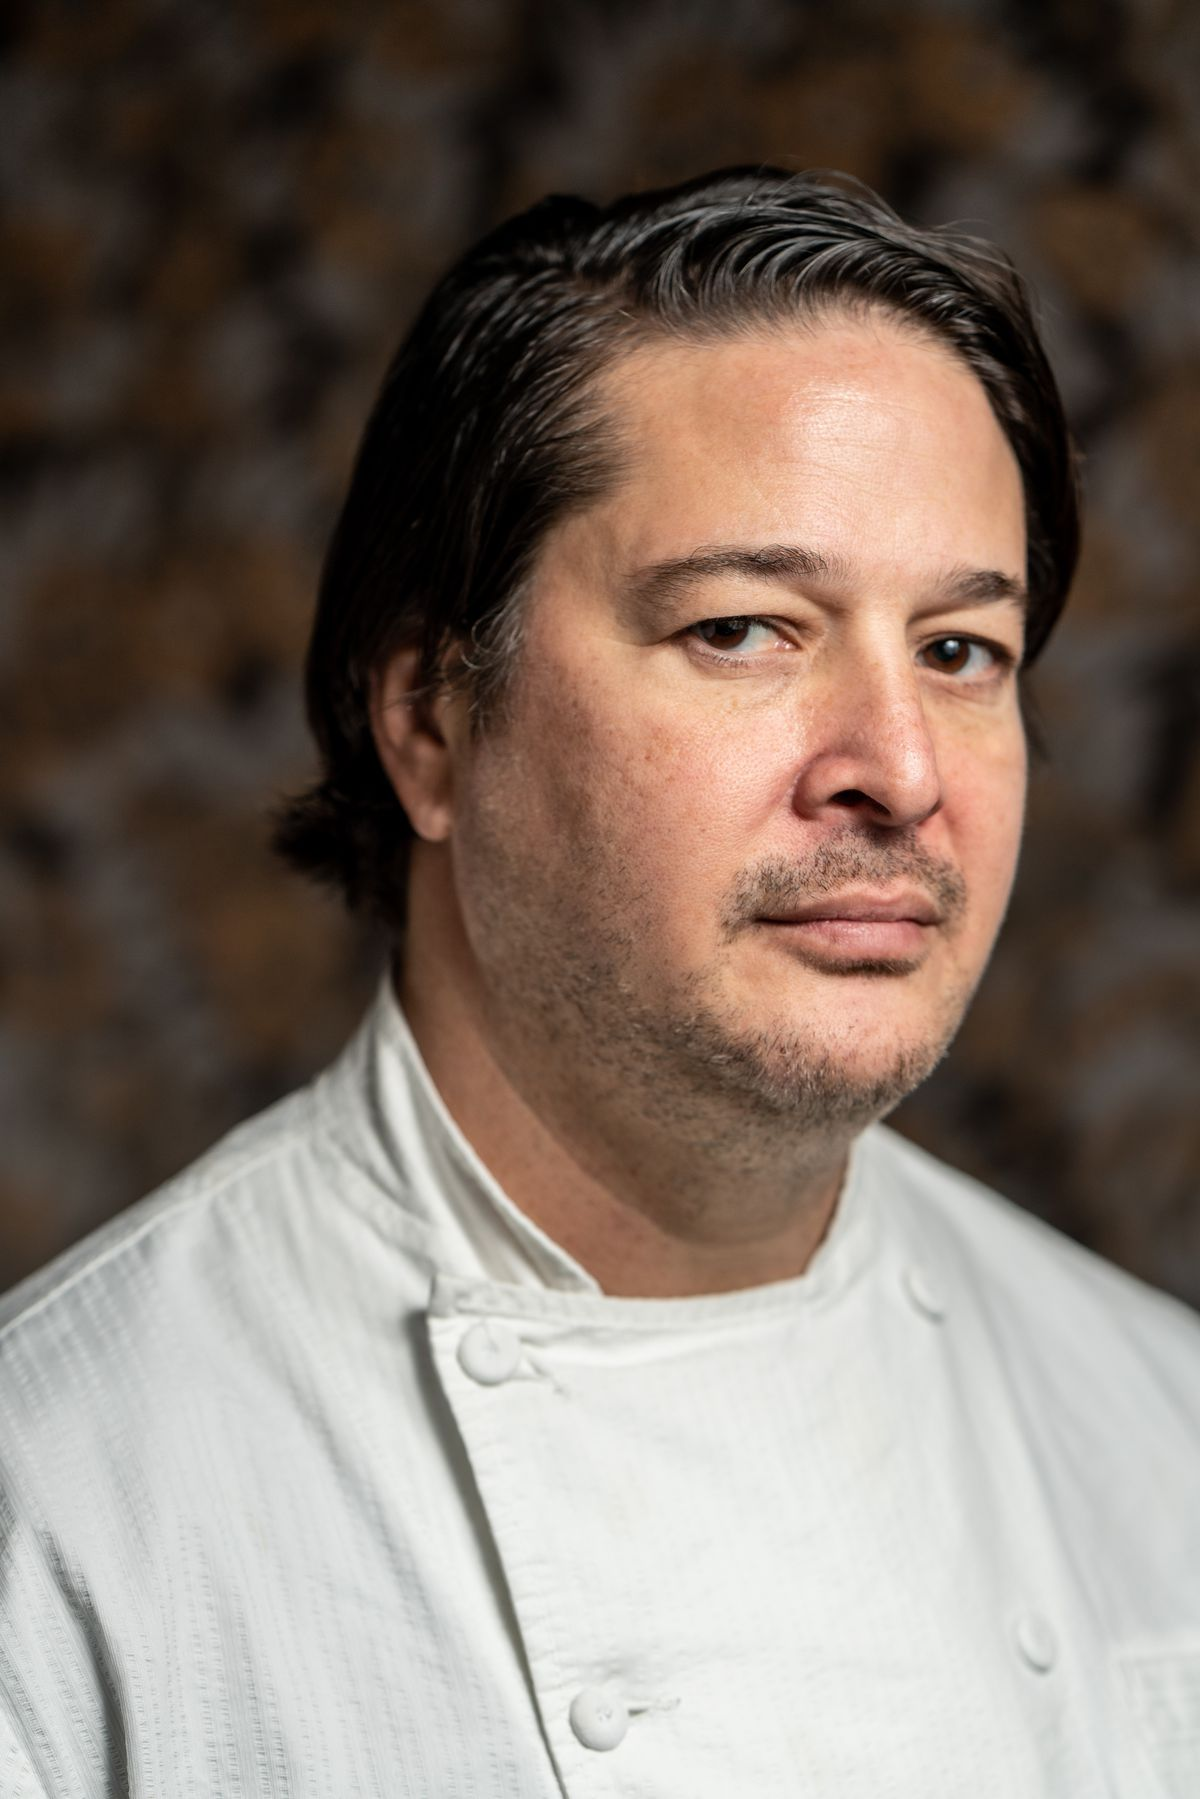 Chef Jason Fox